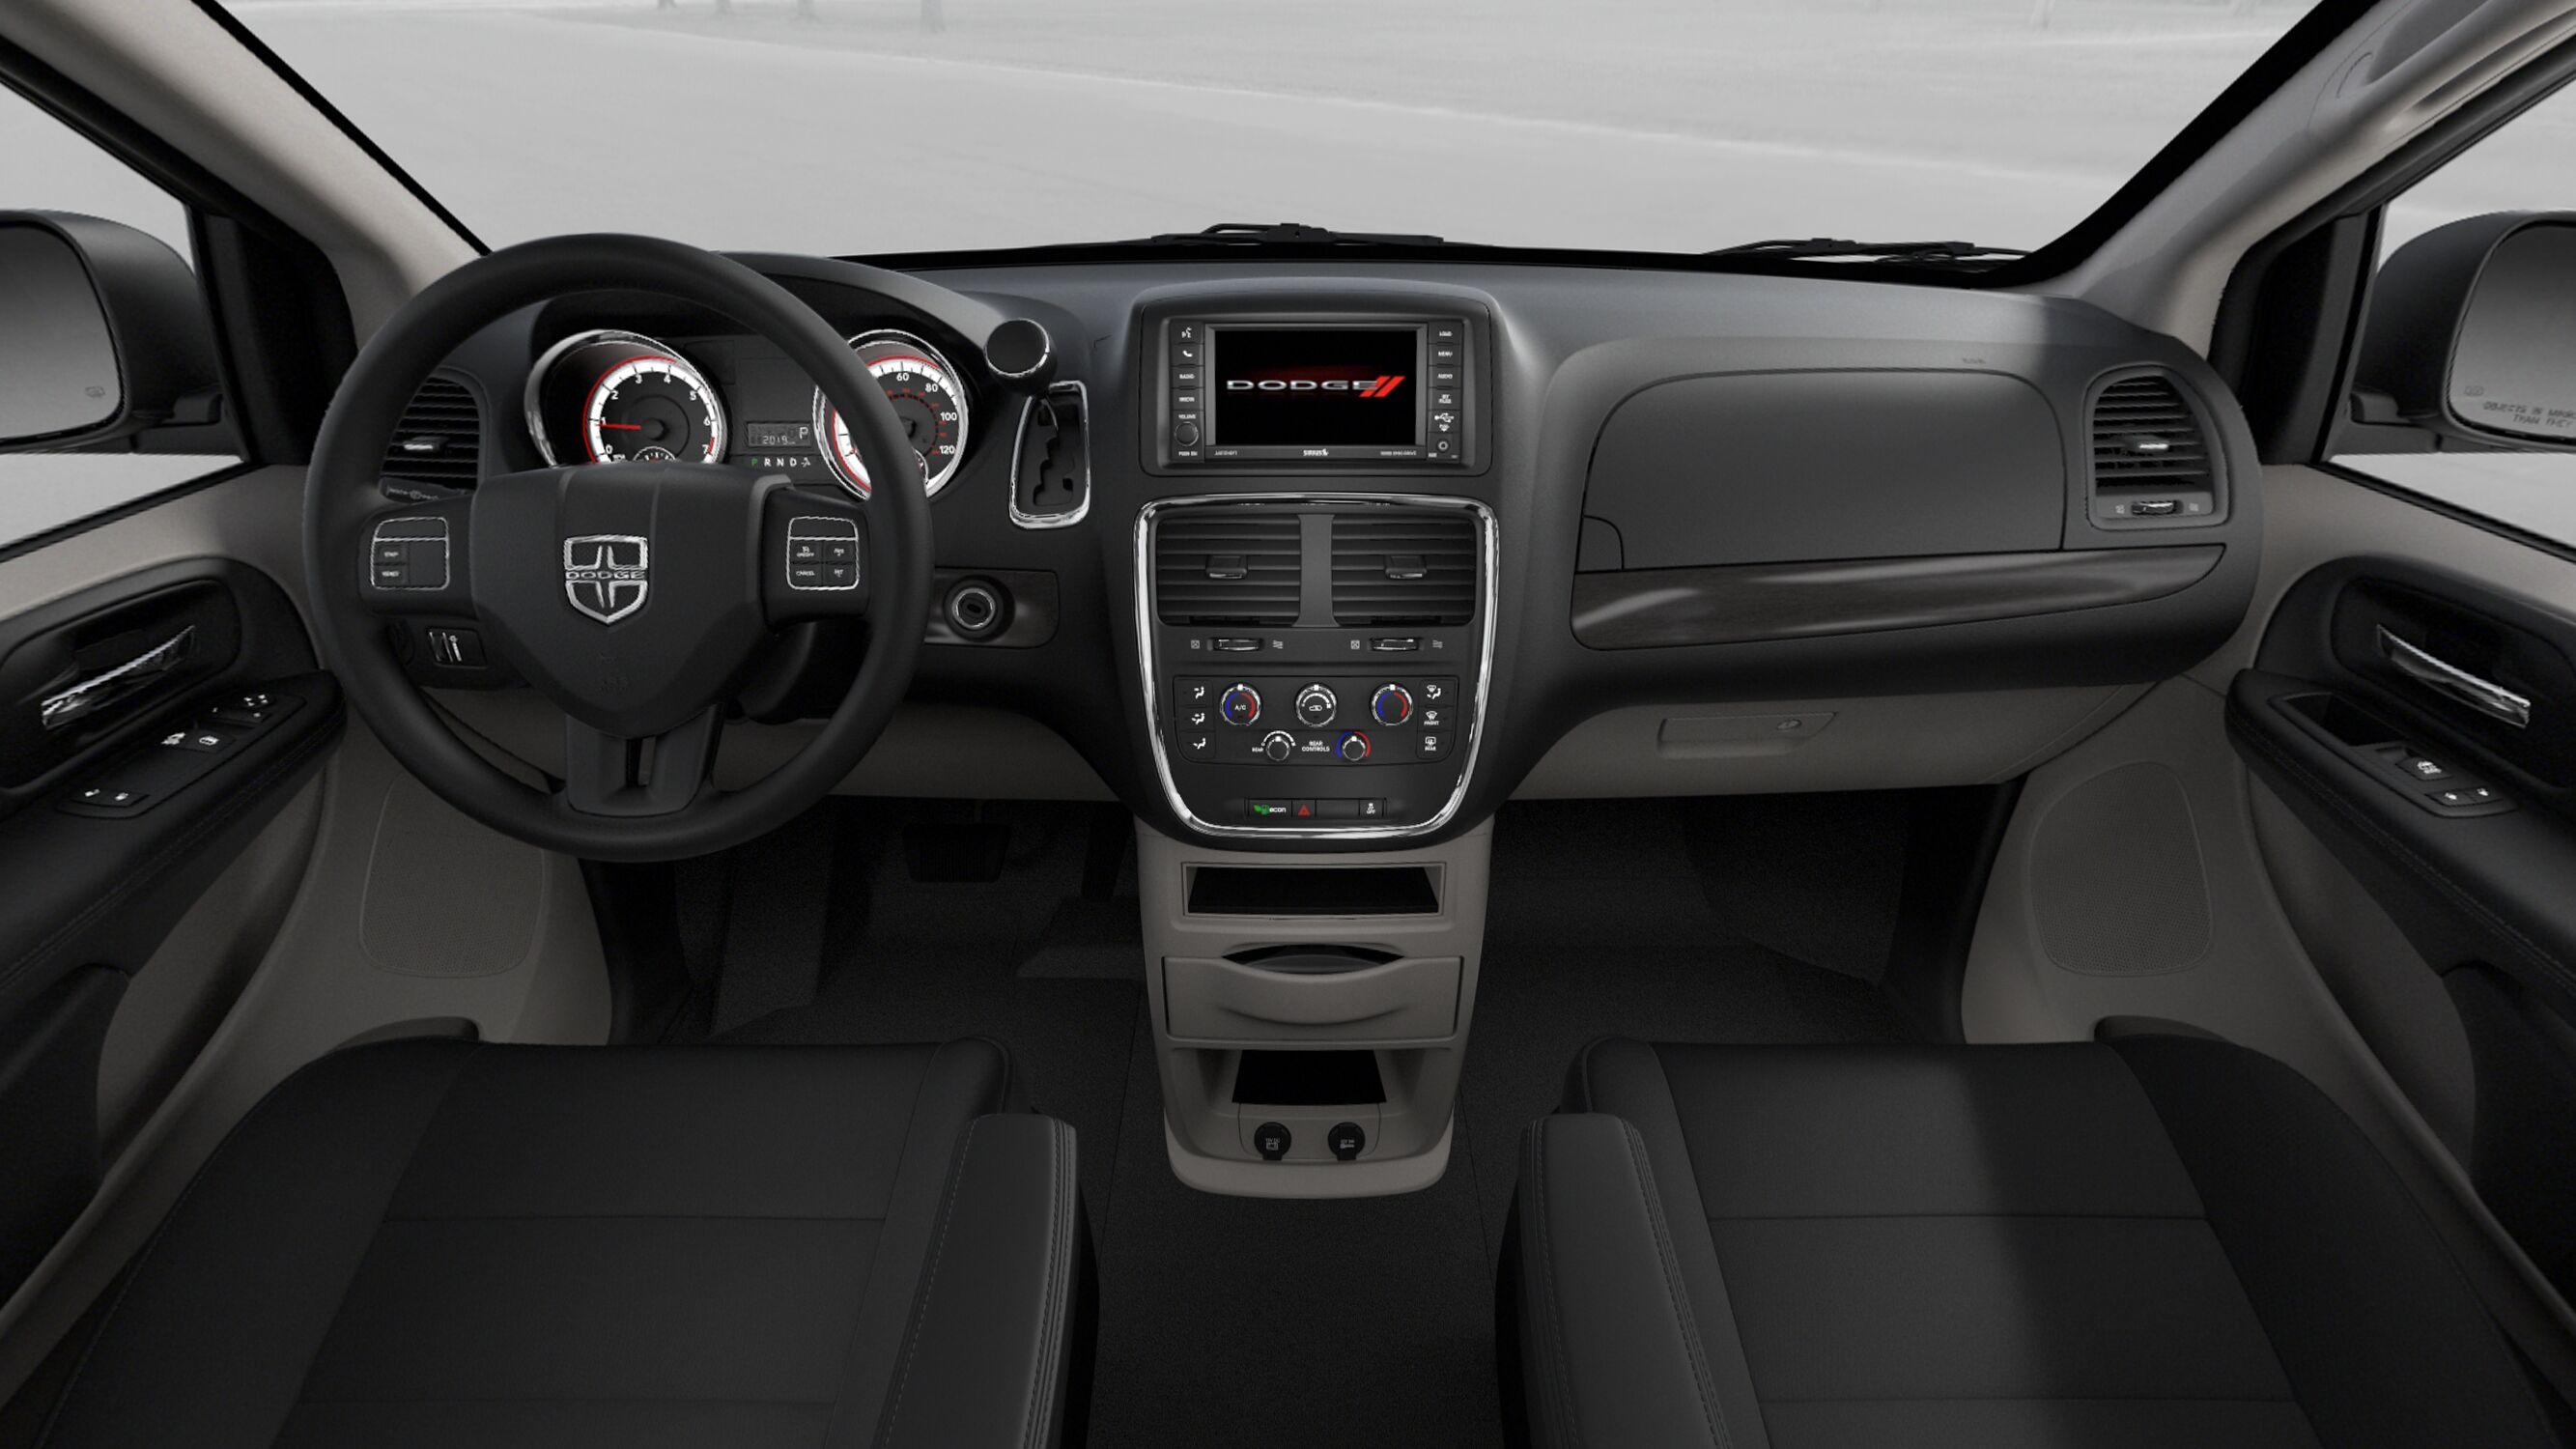 2019 Dodge Grand Caravan Se Claremont Chrysler Dodge Jeep Ram Claremont Ca